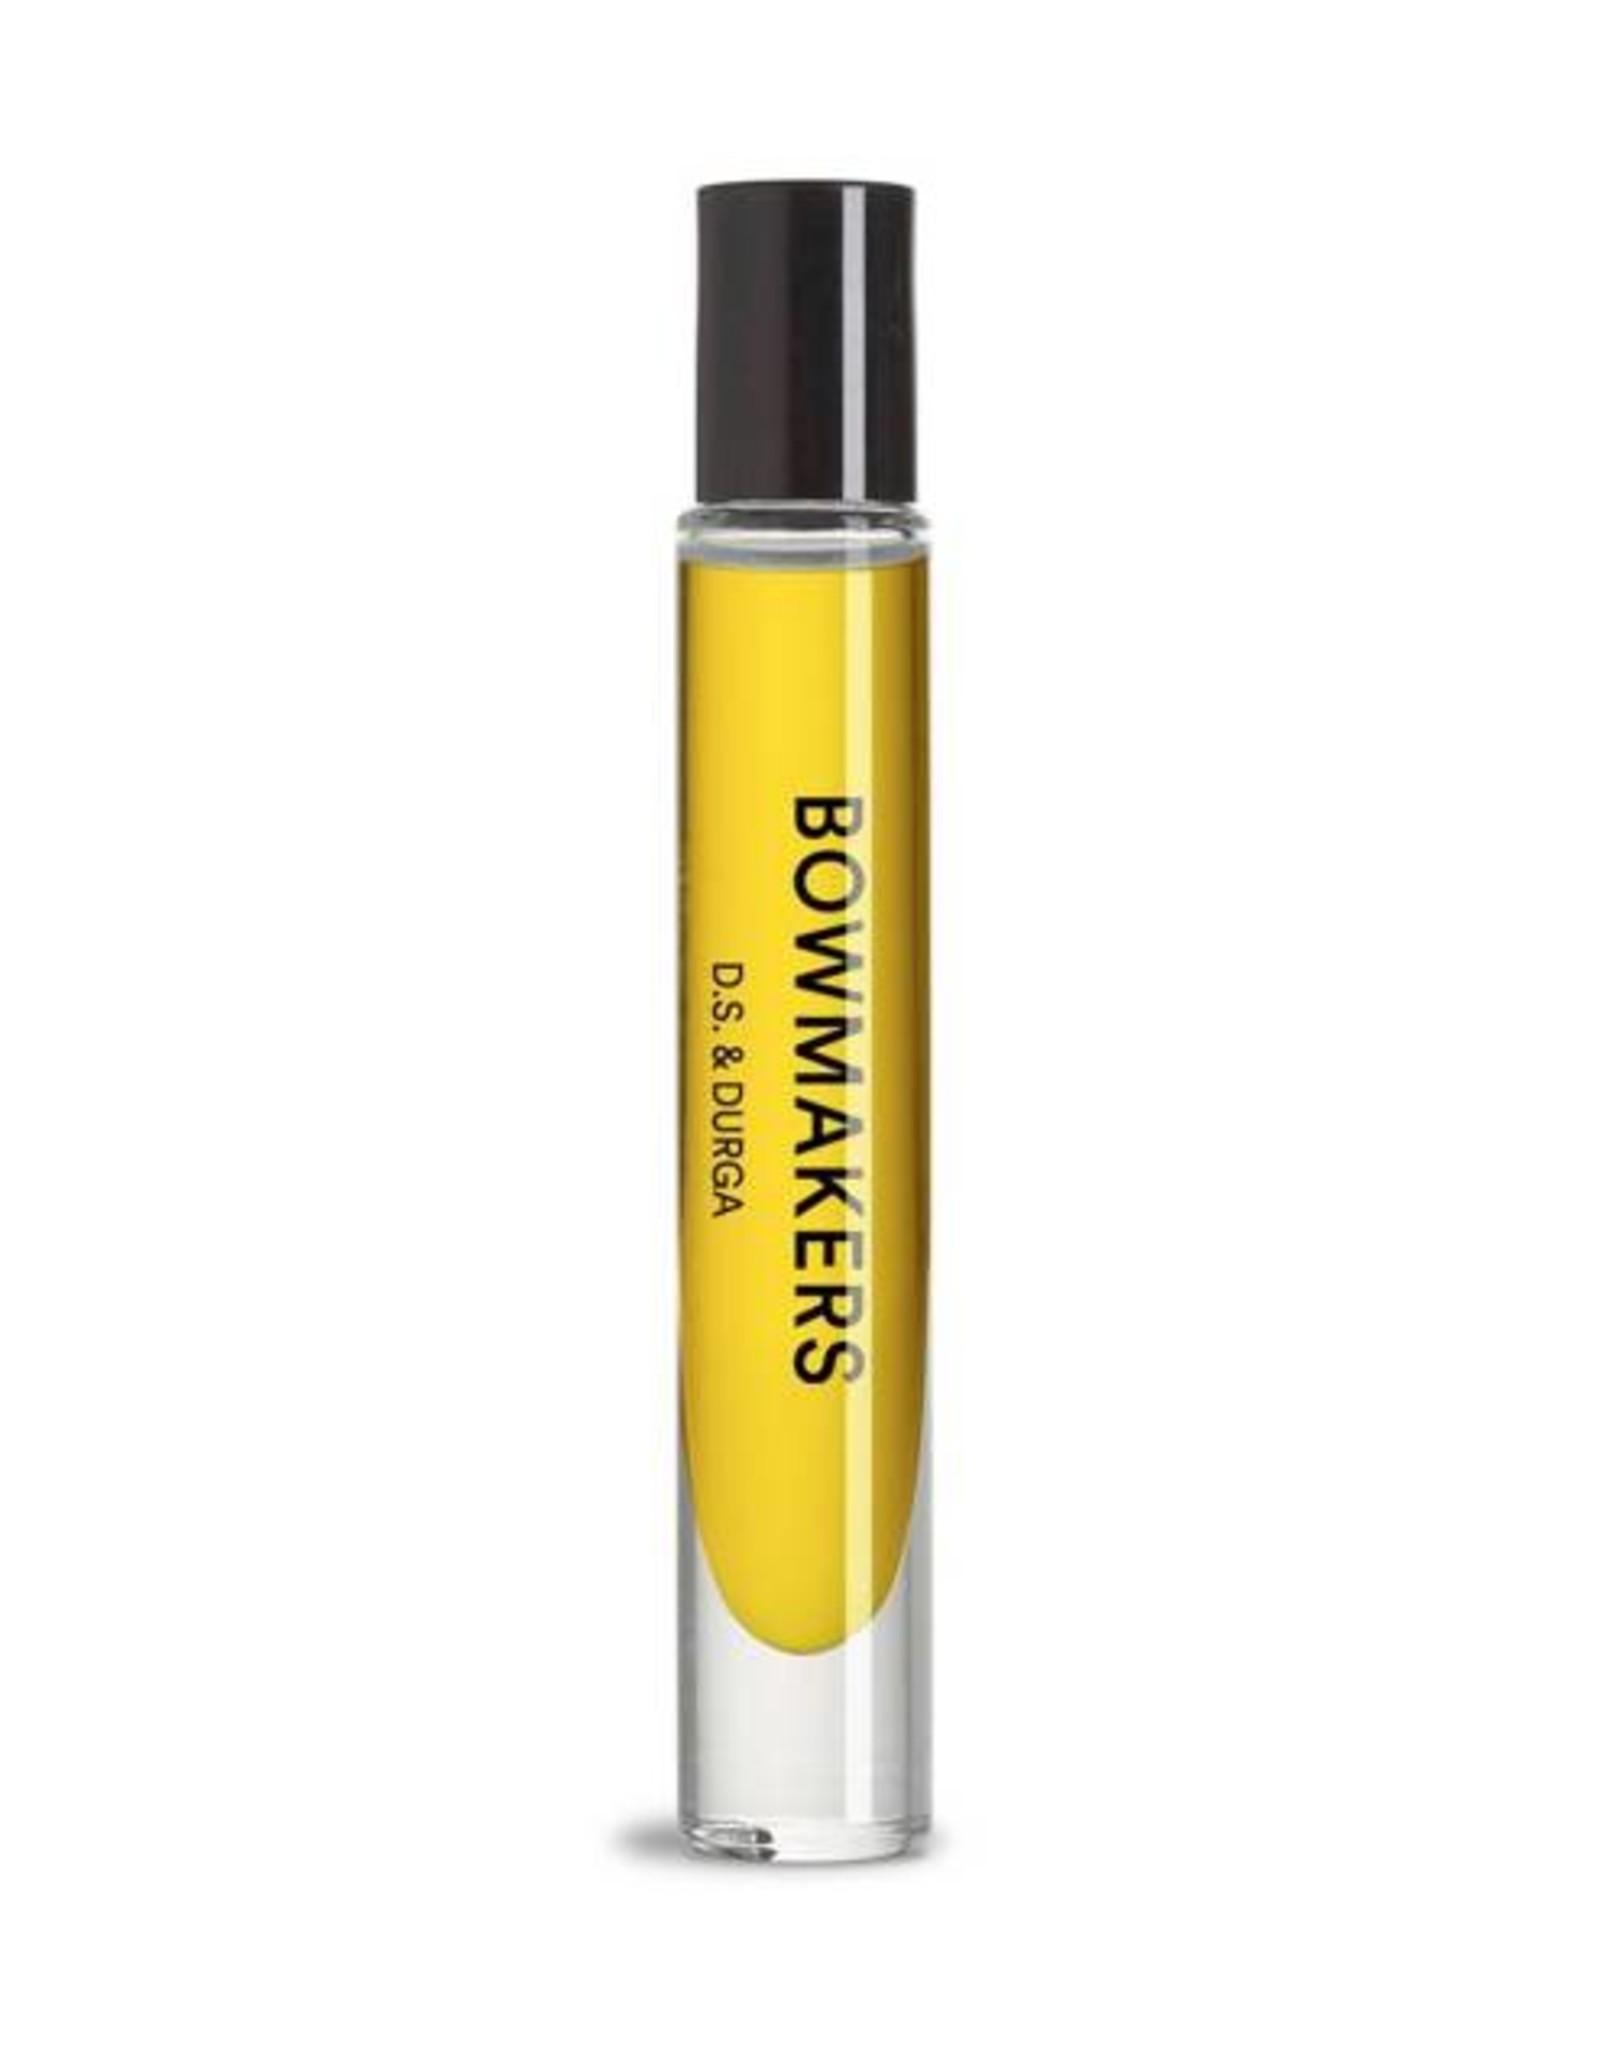 D.S. & DURGA Bowmakers - Pocket Perfume - 10mL